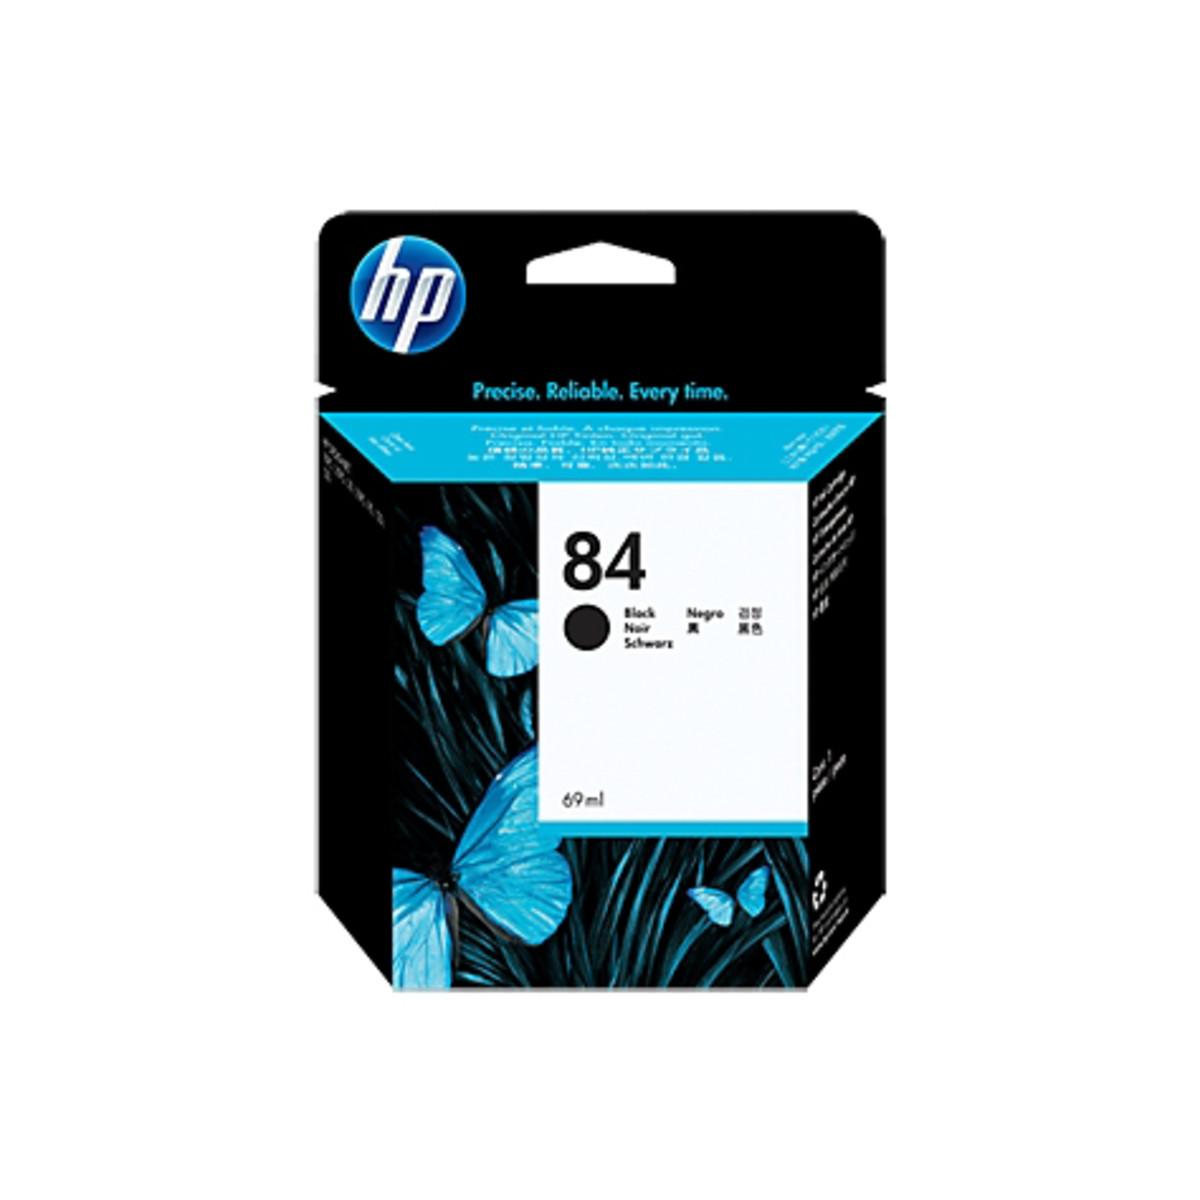 HP 84 (C5016A) Black Ink Cartridge